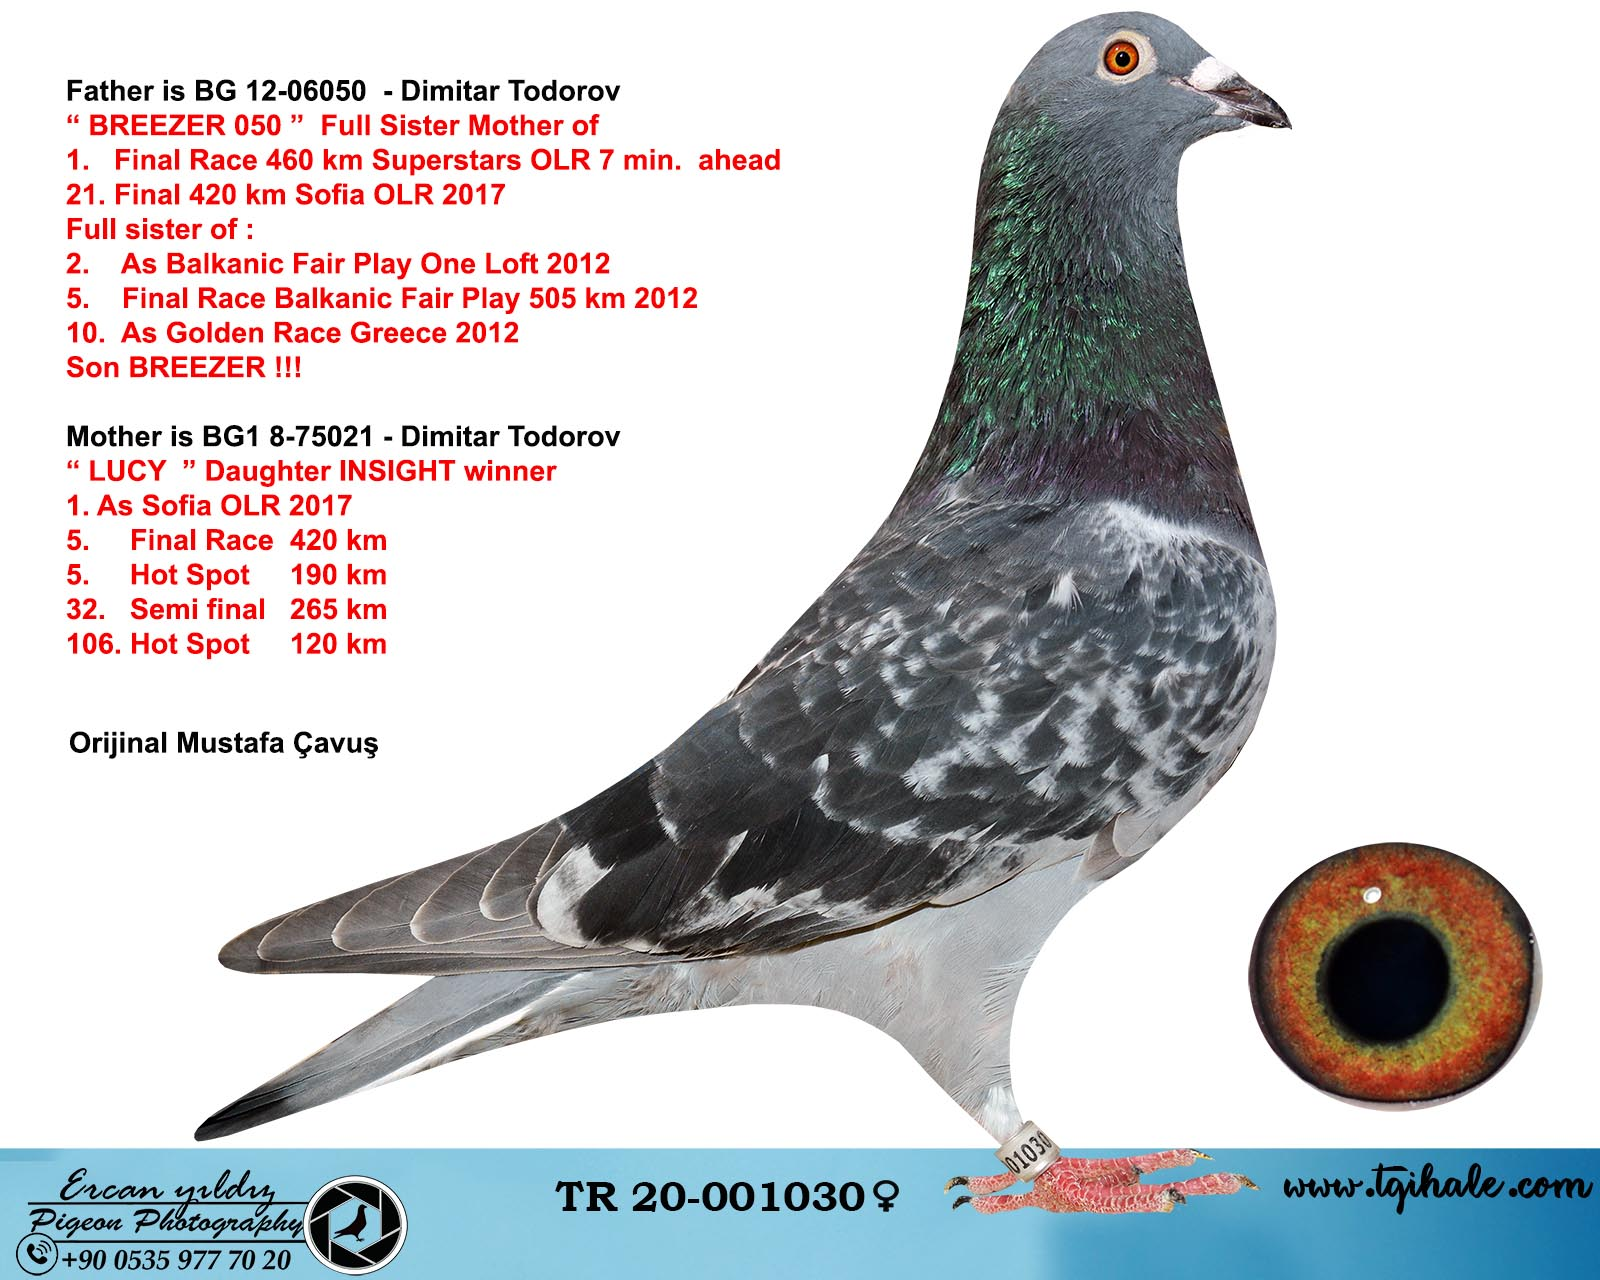 TR20-001030 DİŞİ / BABASI BREEZER OĞLU  ANNESİ INSIGHT KIZI DIMITAR TODOROV % 100